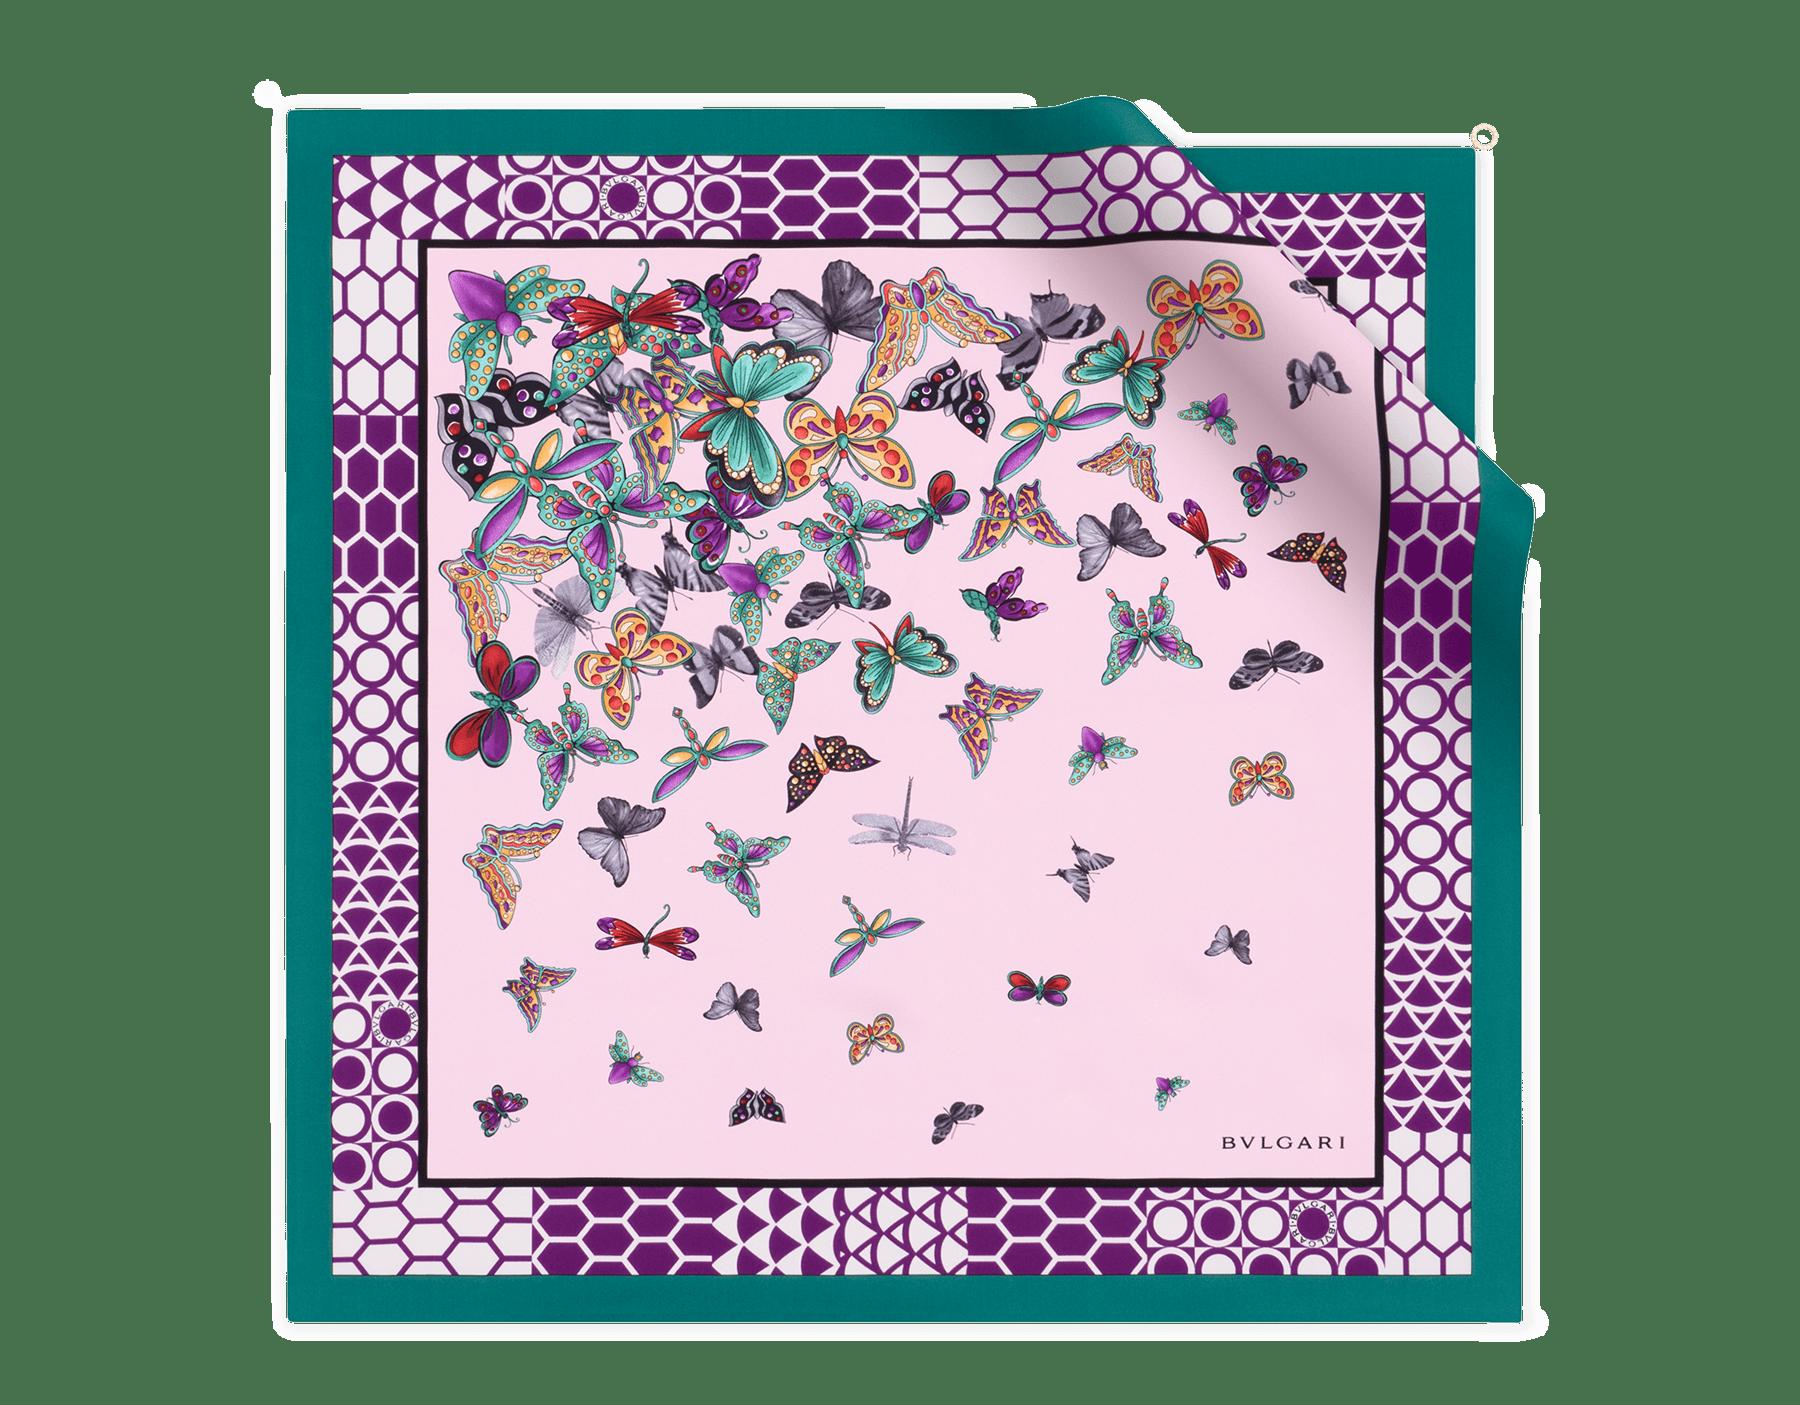 Rosa di Francia B Fly scarf in fine silk twill. 243922 image 1